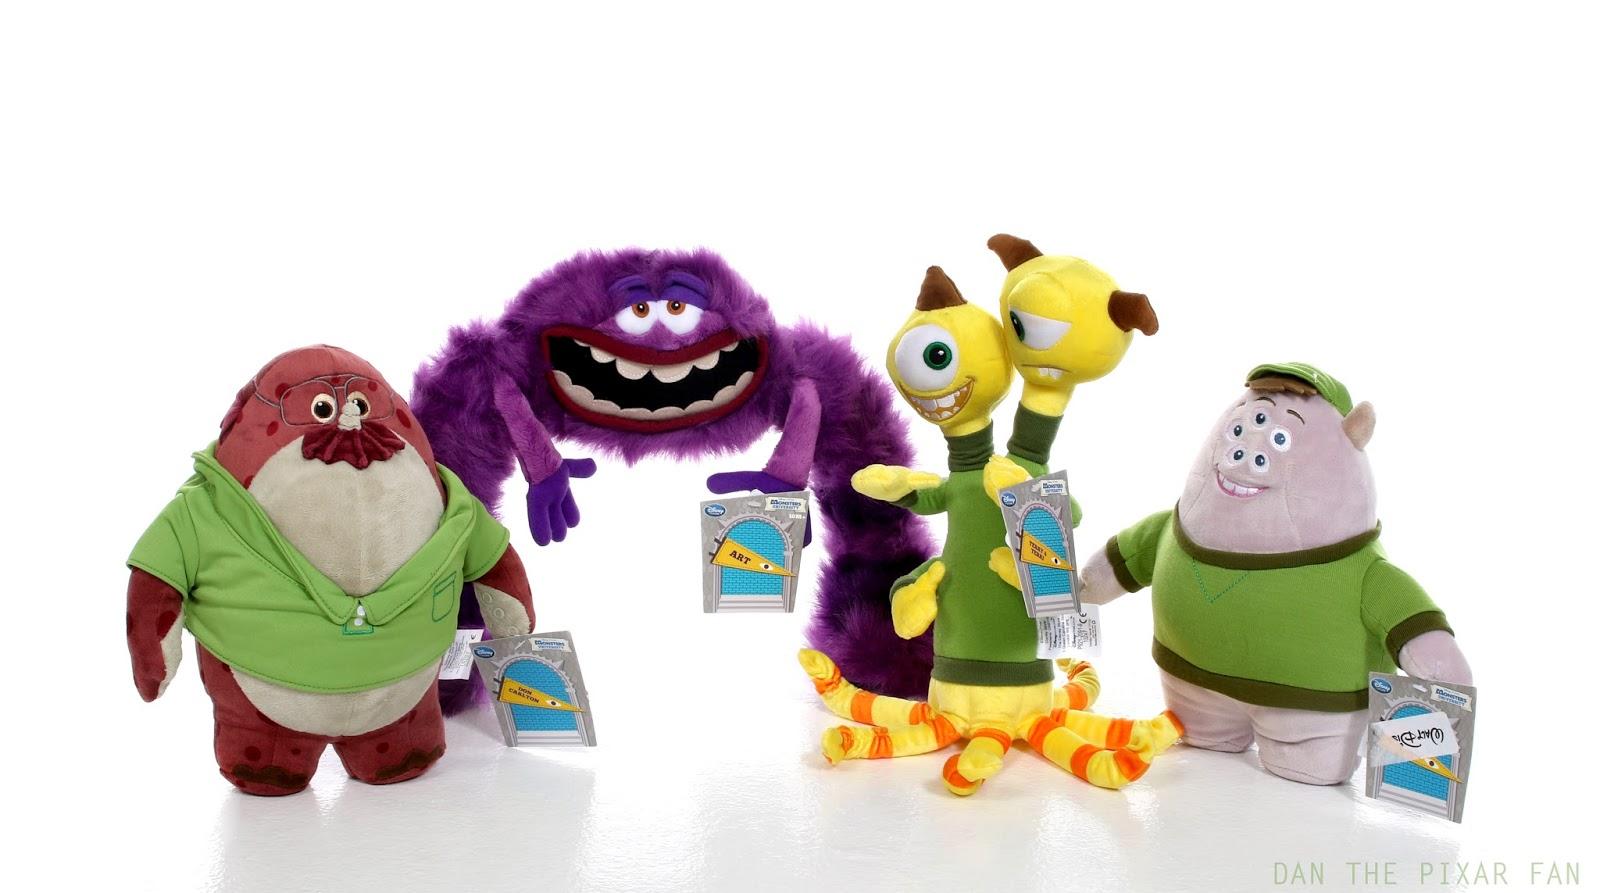 Dan The Pixar Fan Monsters University Disney Store Oozma Kappa Plush